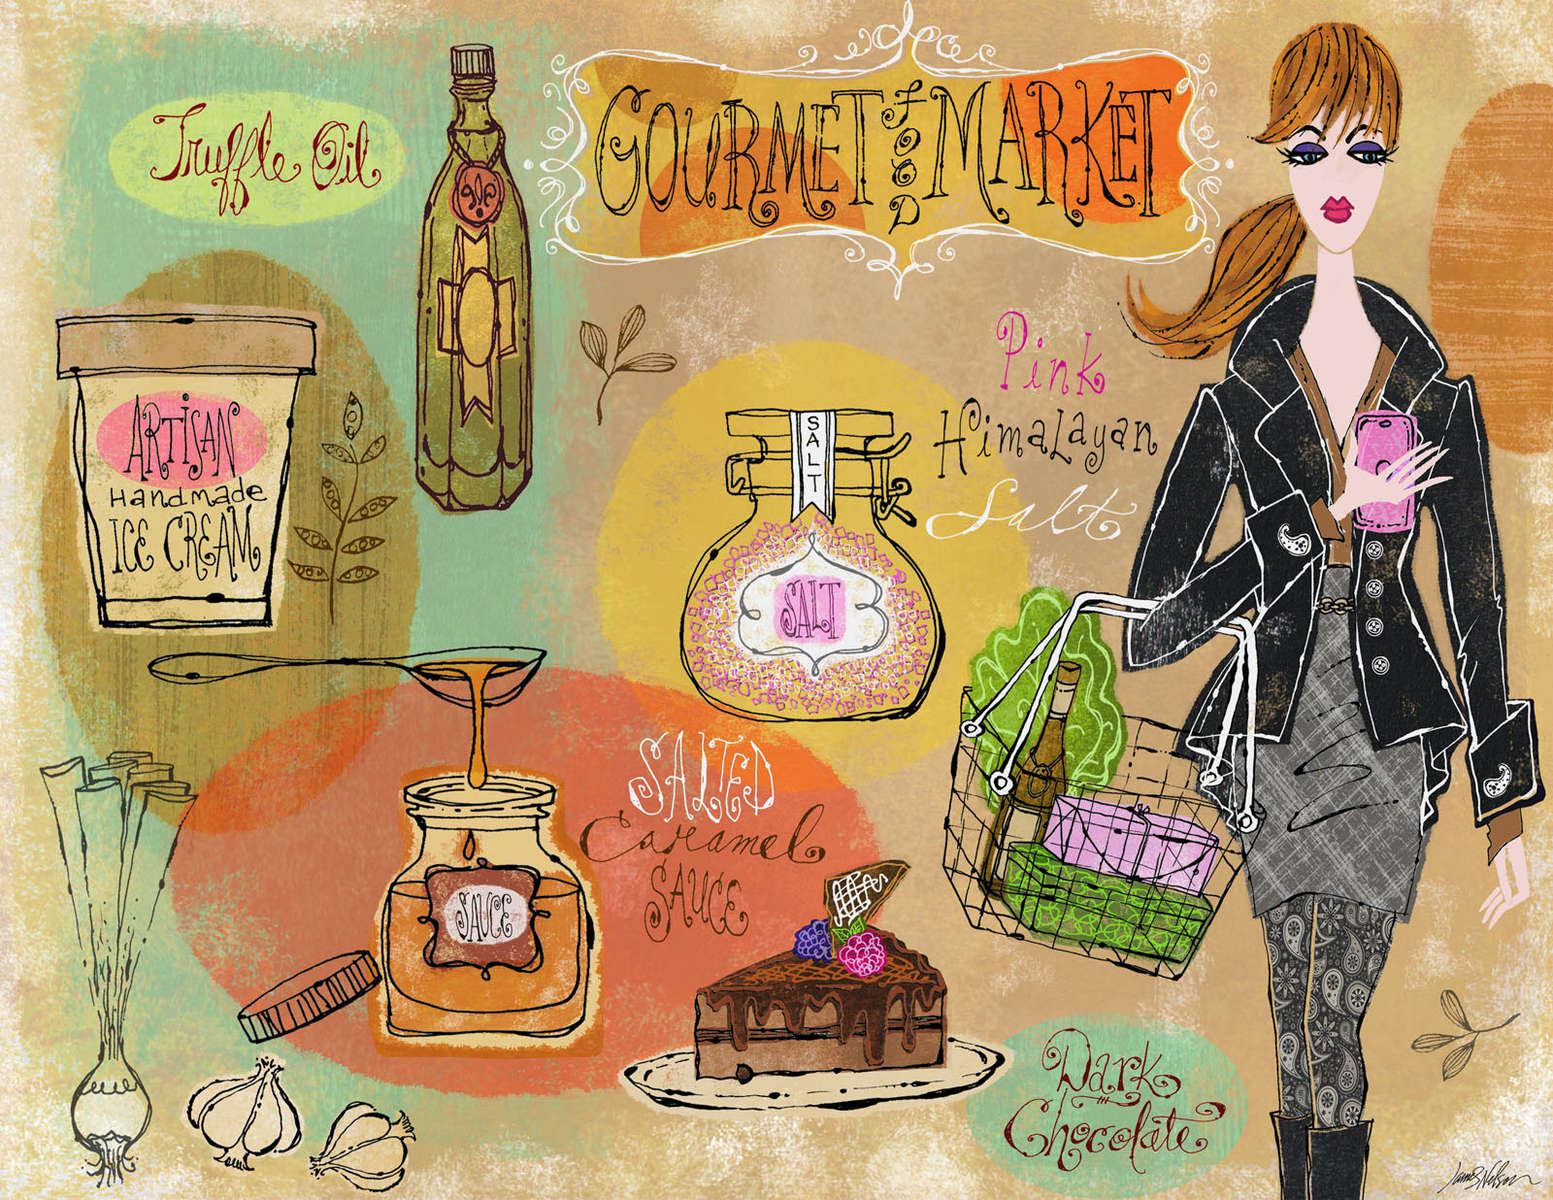 Nelson_gourmet_market